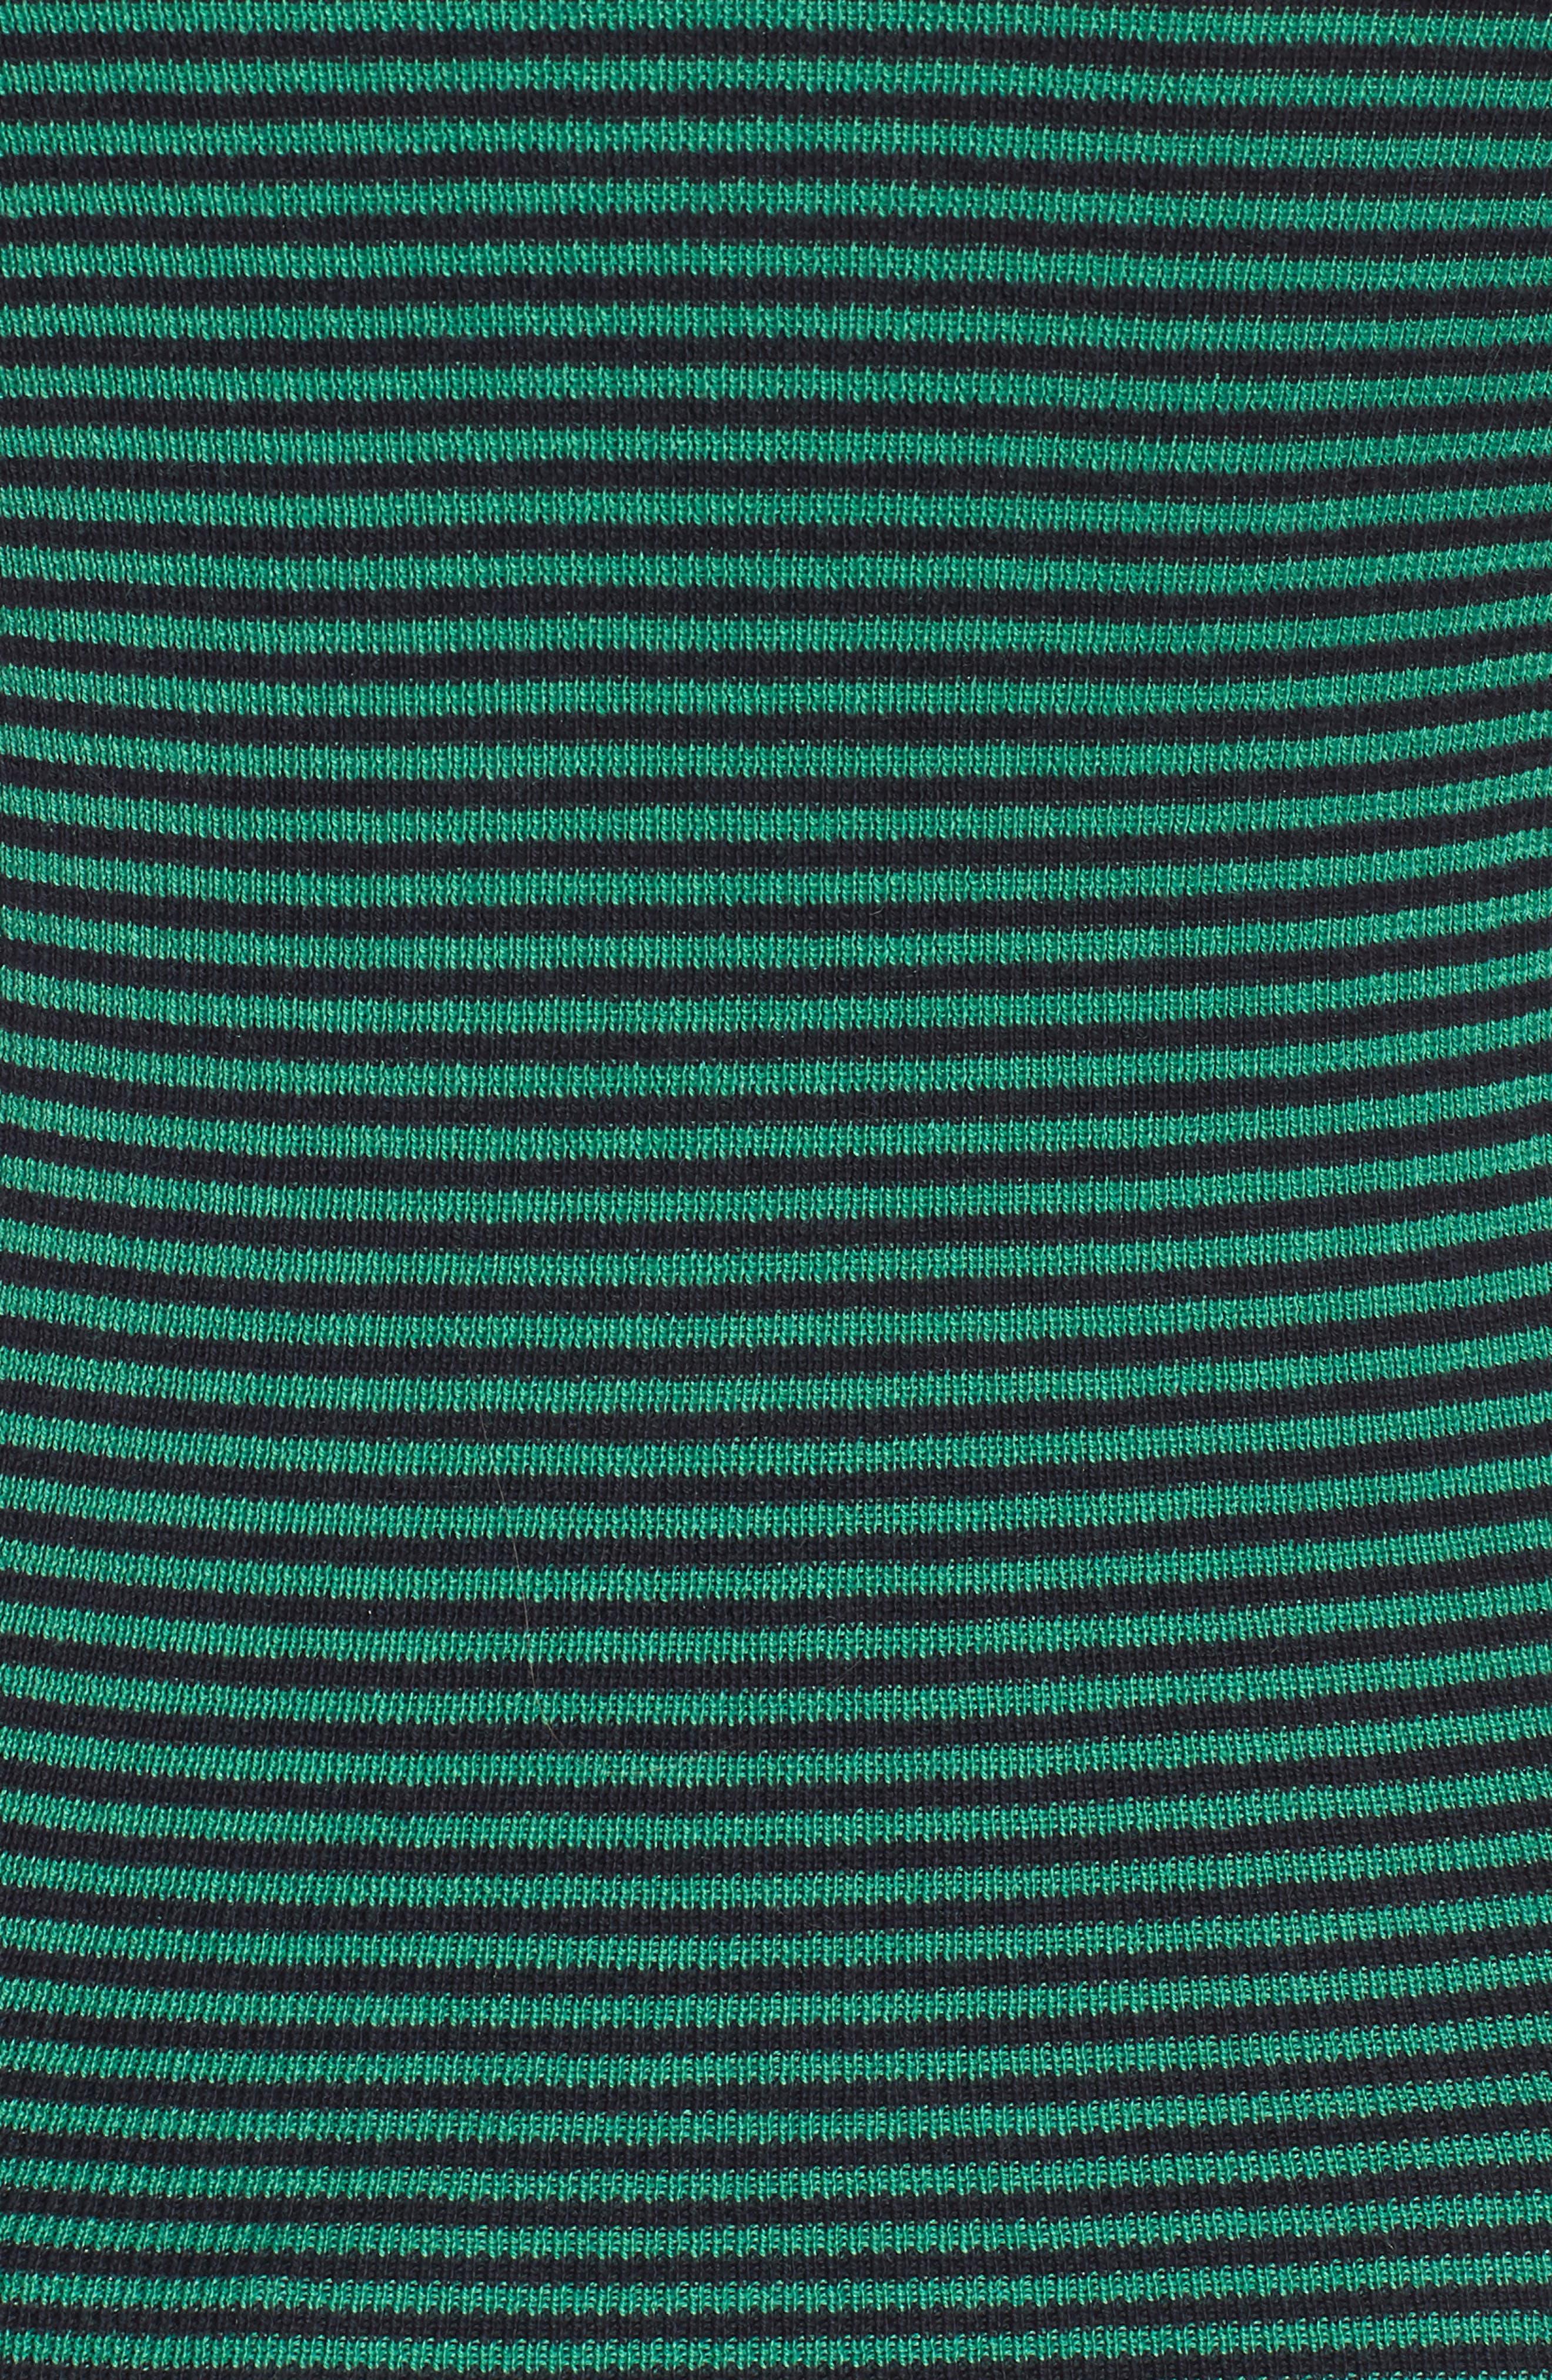 Stripe Crewneck Sweater,                             Alternate thumbnail 6, color,                             315